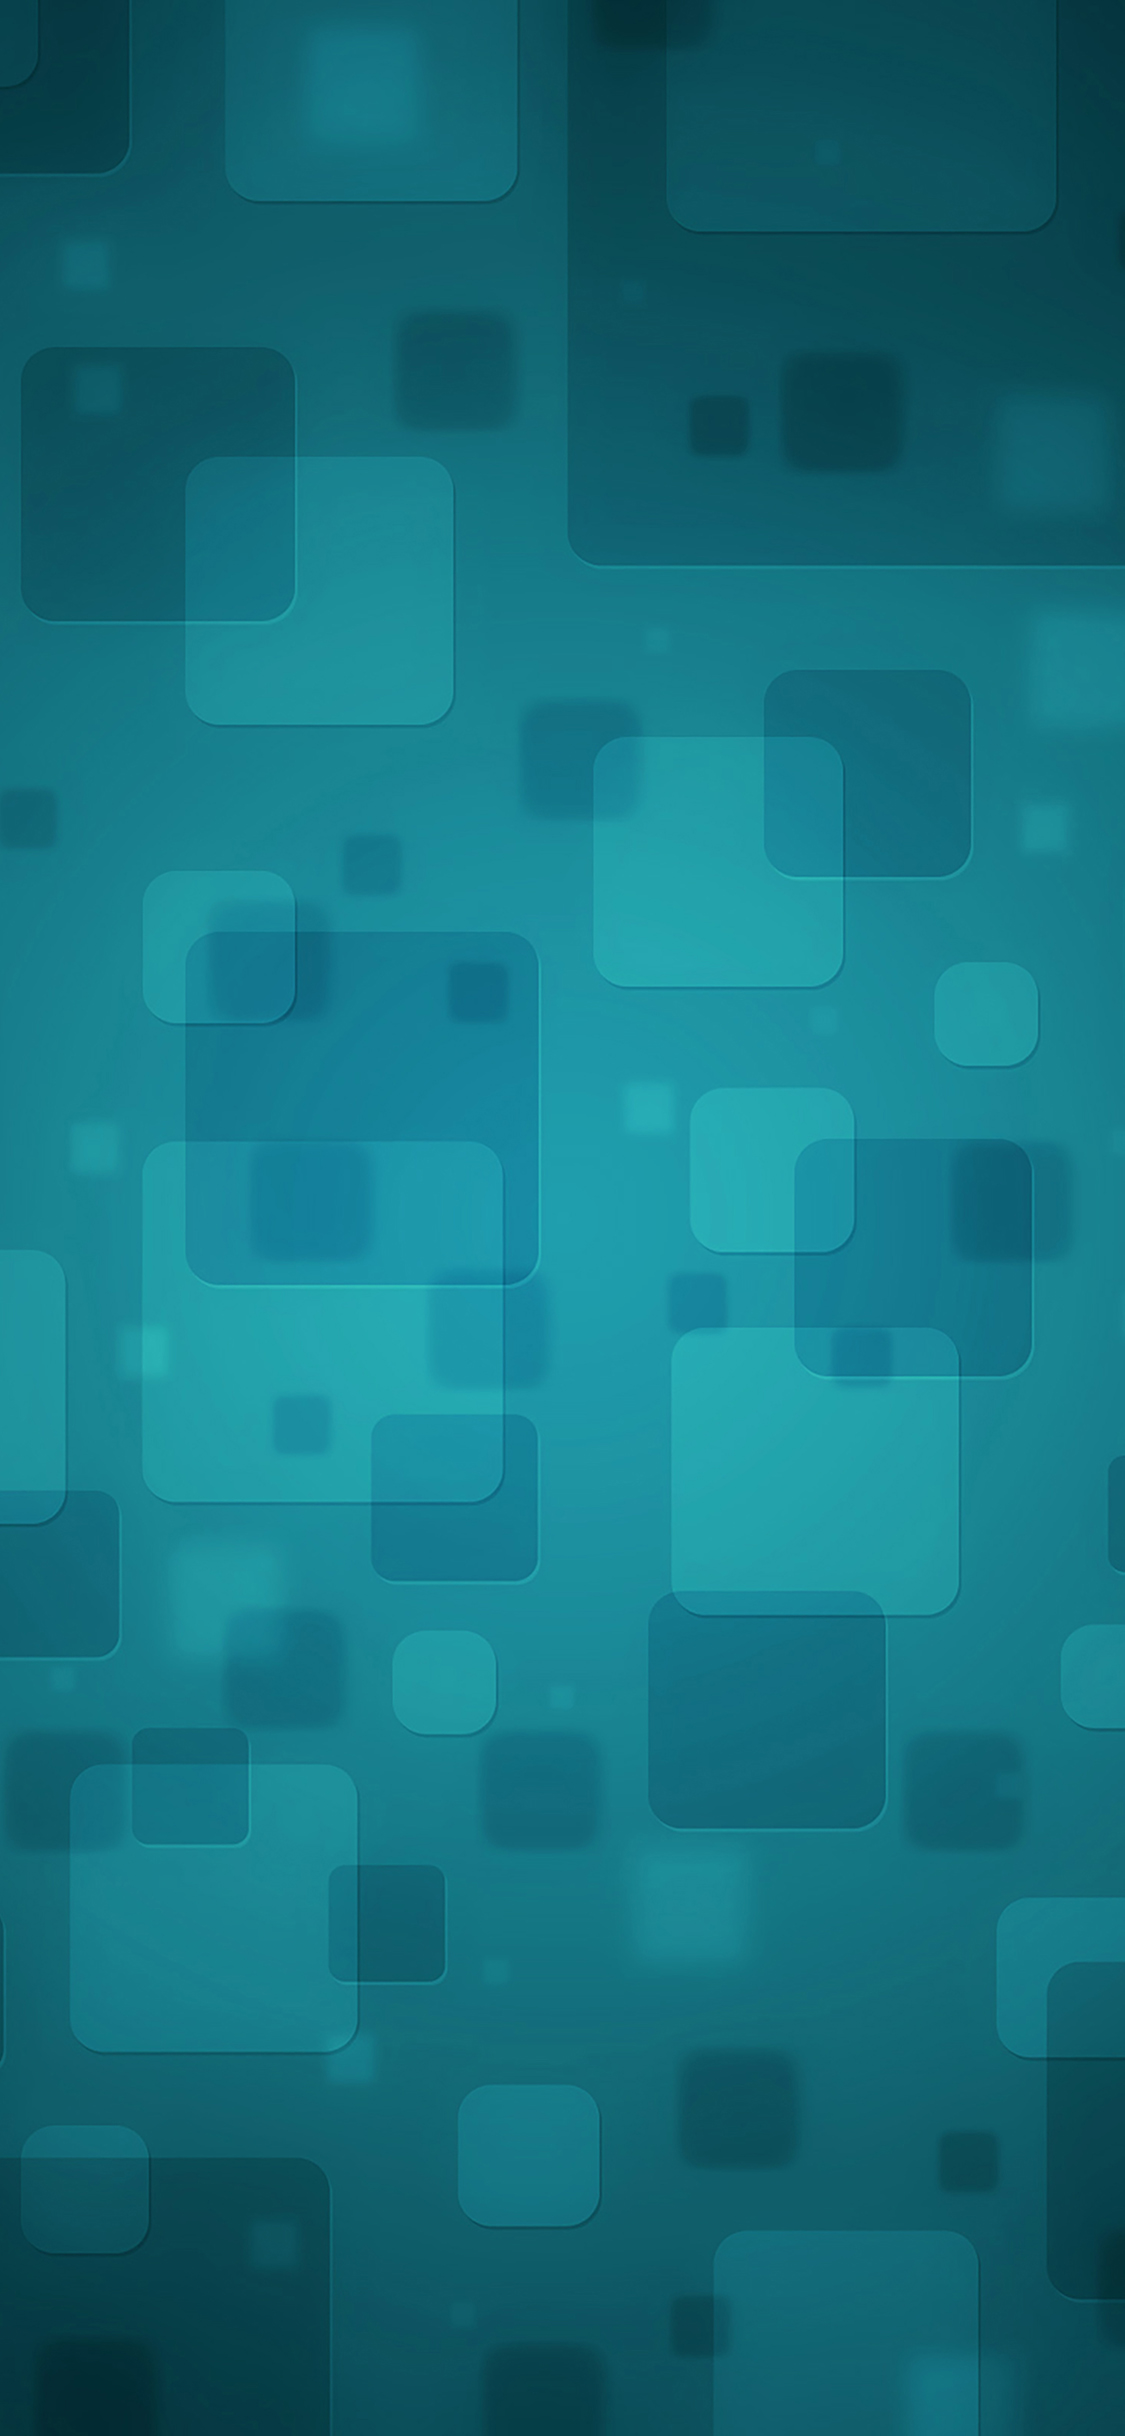 iPhoneXpapers.com-Apple-iPhone-wallpaper-vf36-squares-blue-sea-art-pattern